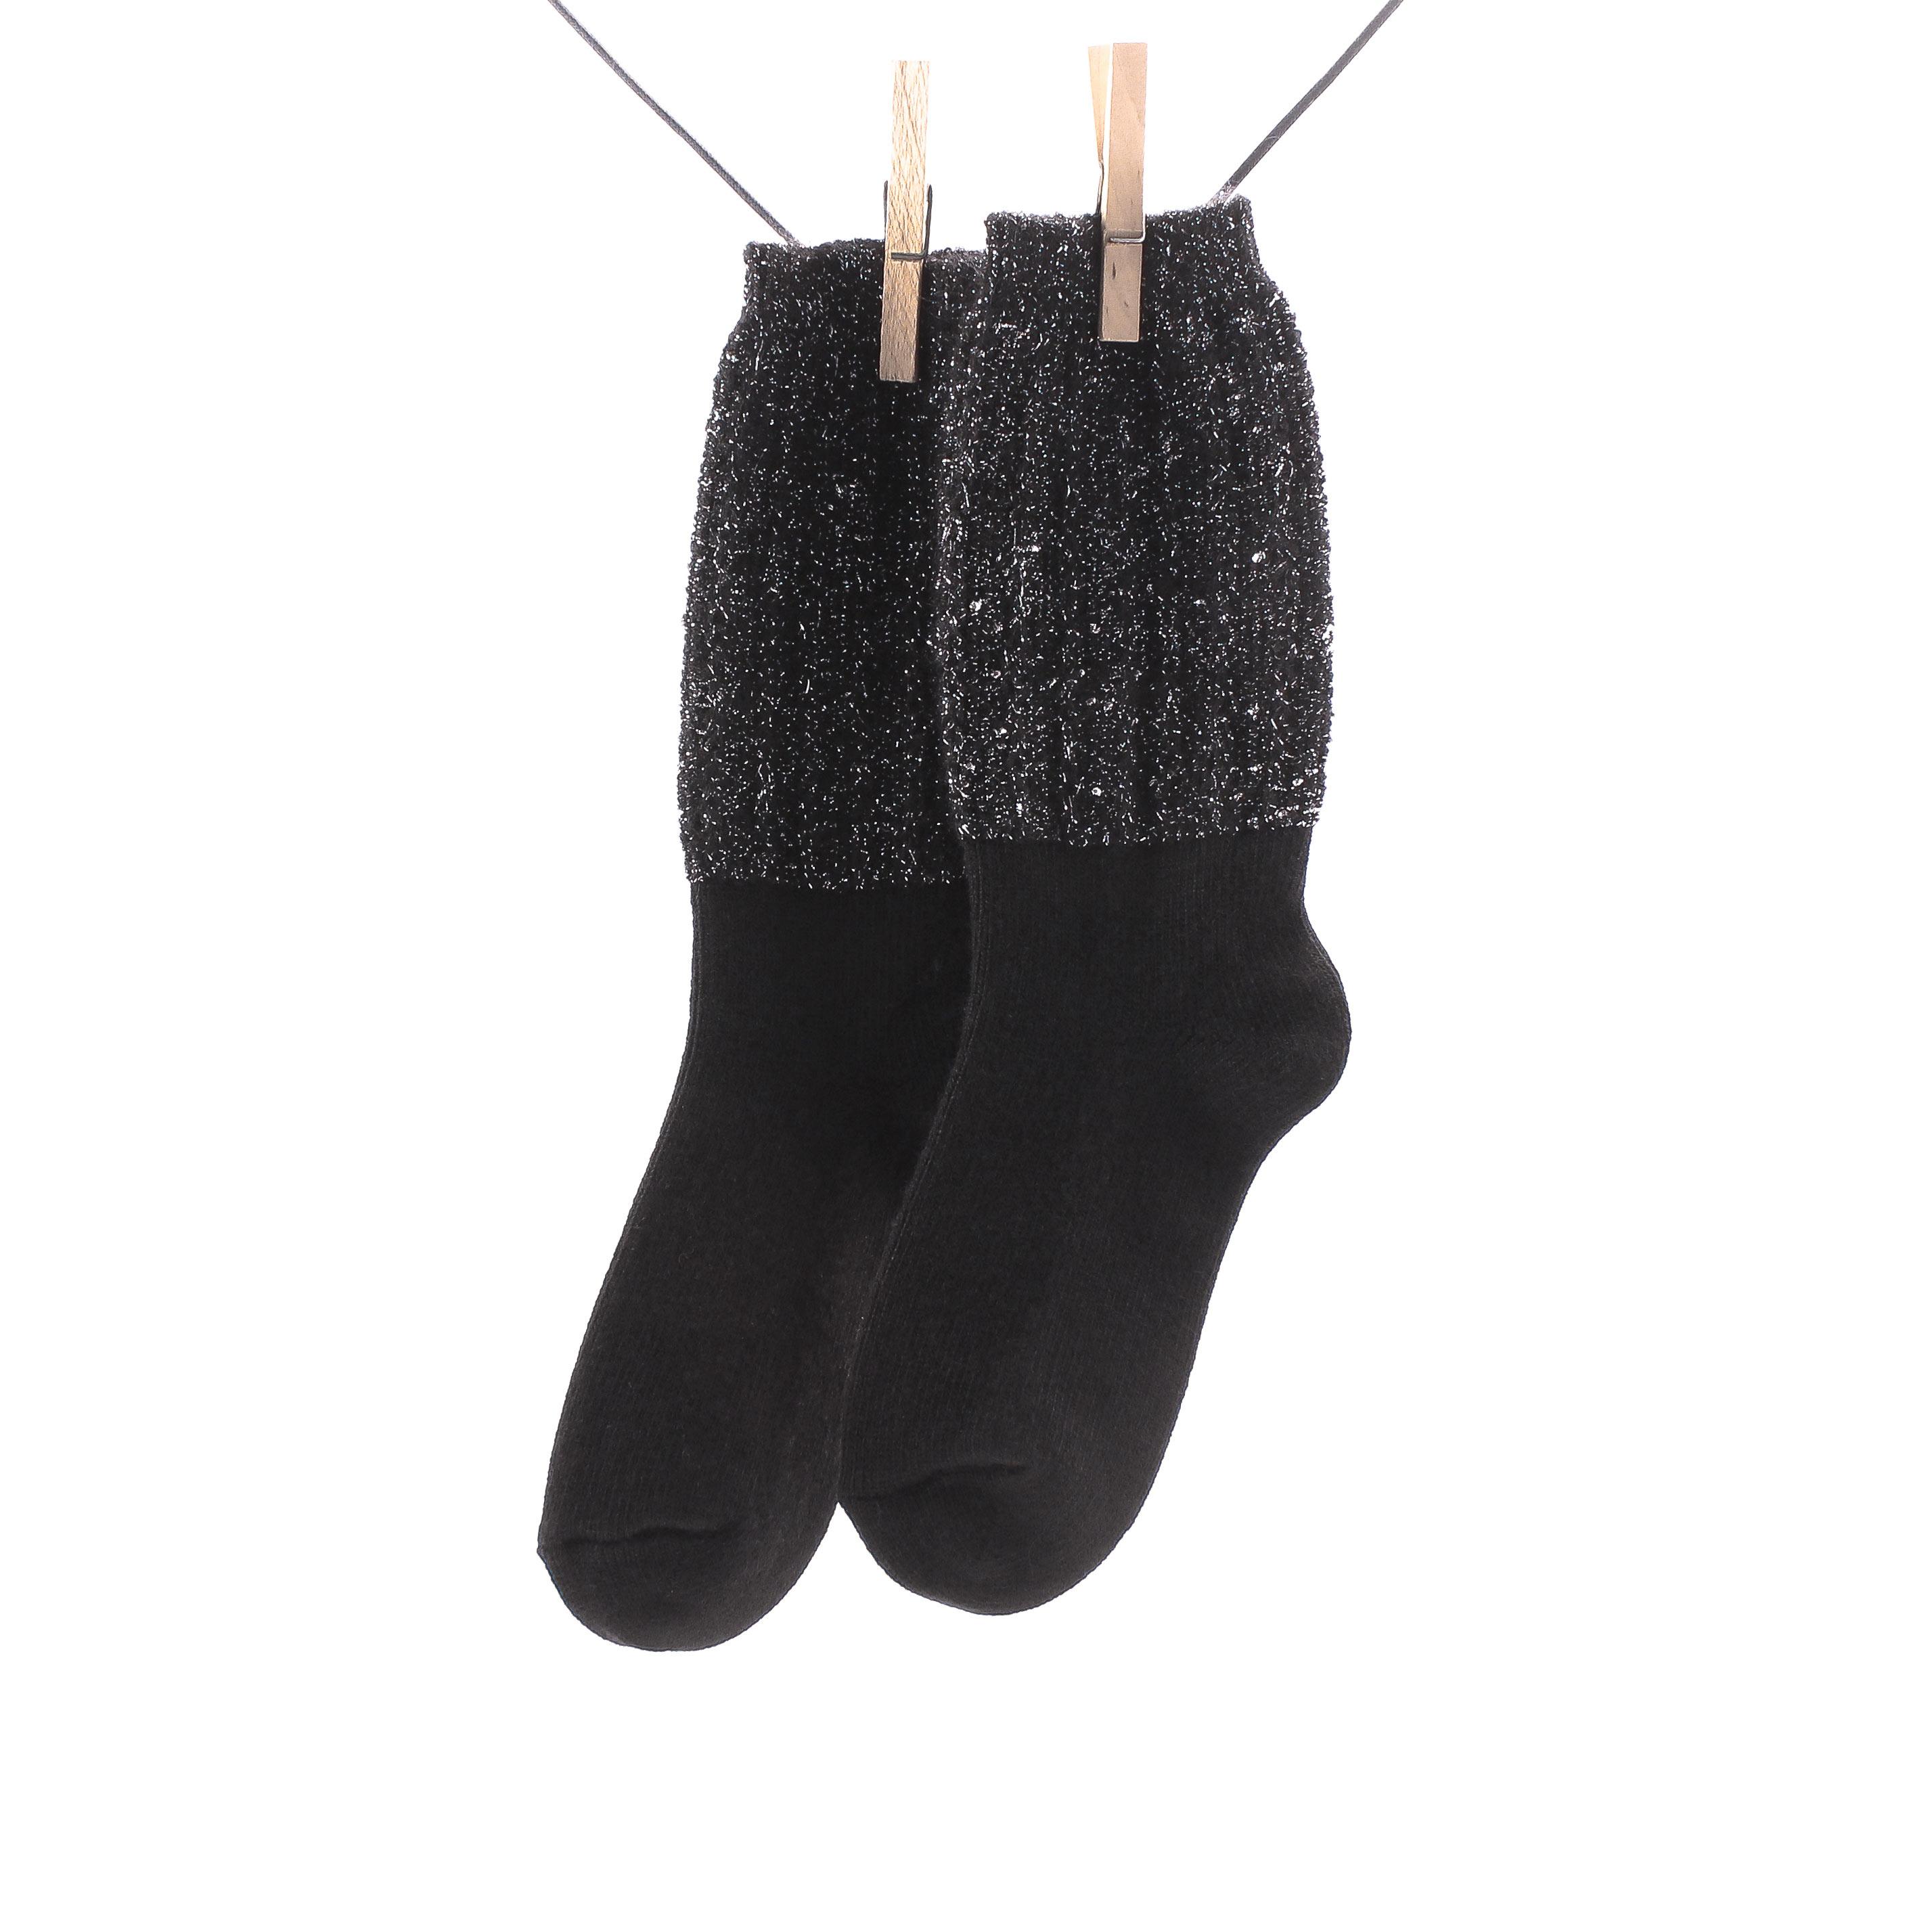 Cronert, 15408 Wolle-Mohair-Kashmir Socke Damen, schwarz Grosse 35-38